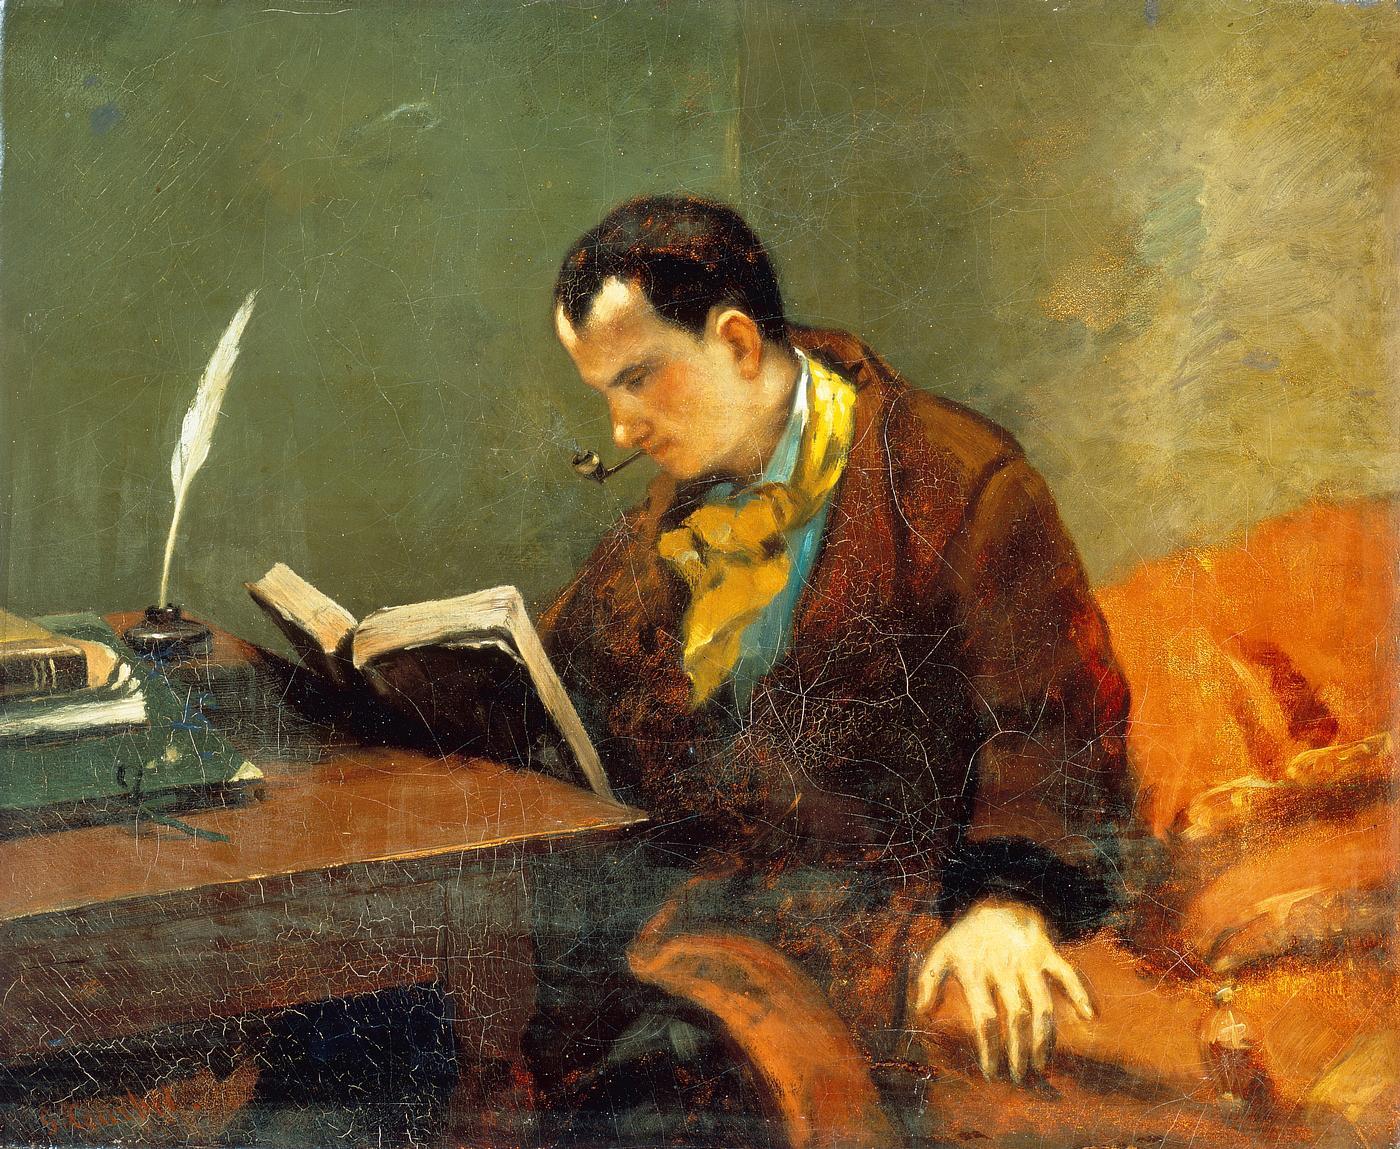 Umberto eco disneyland essay